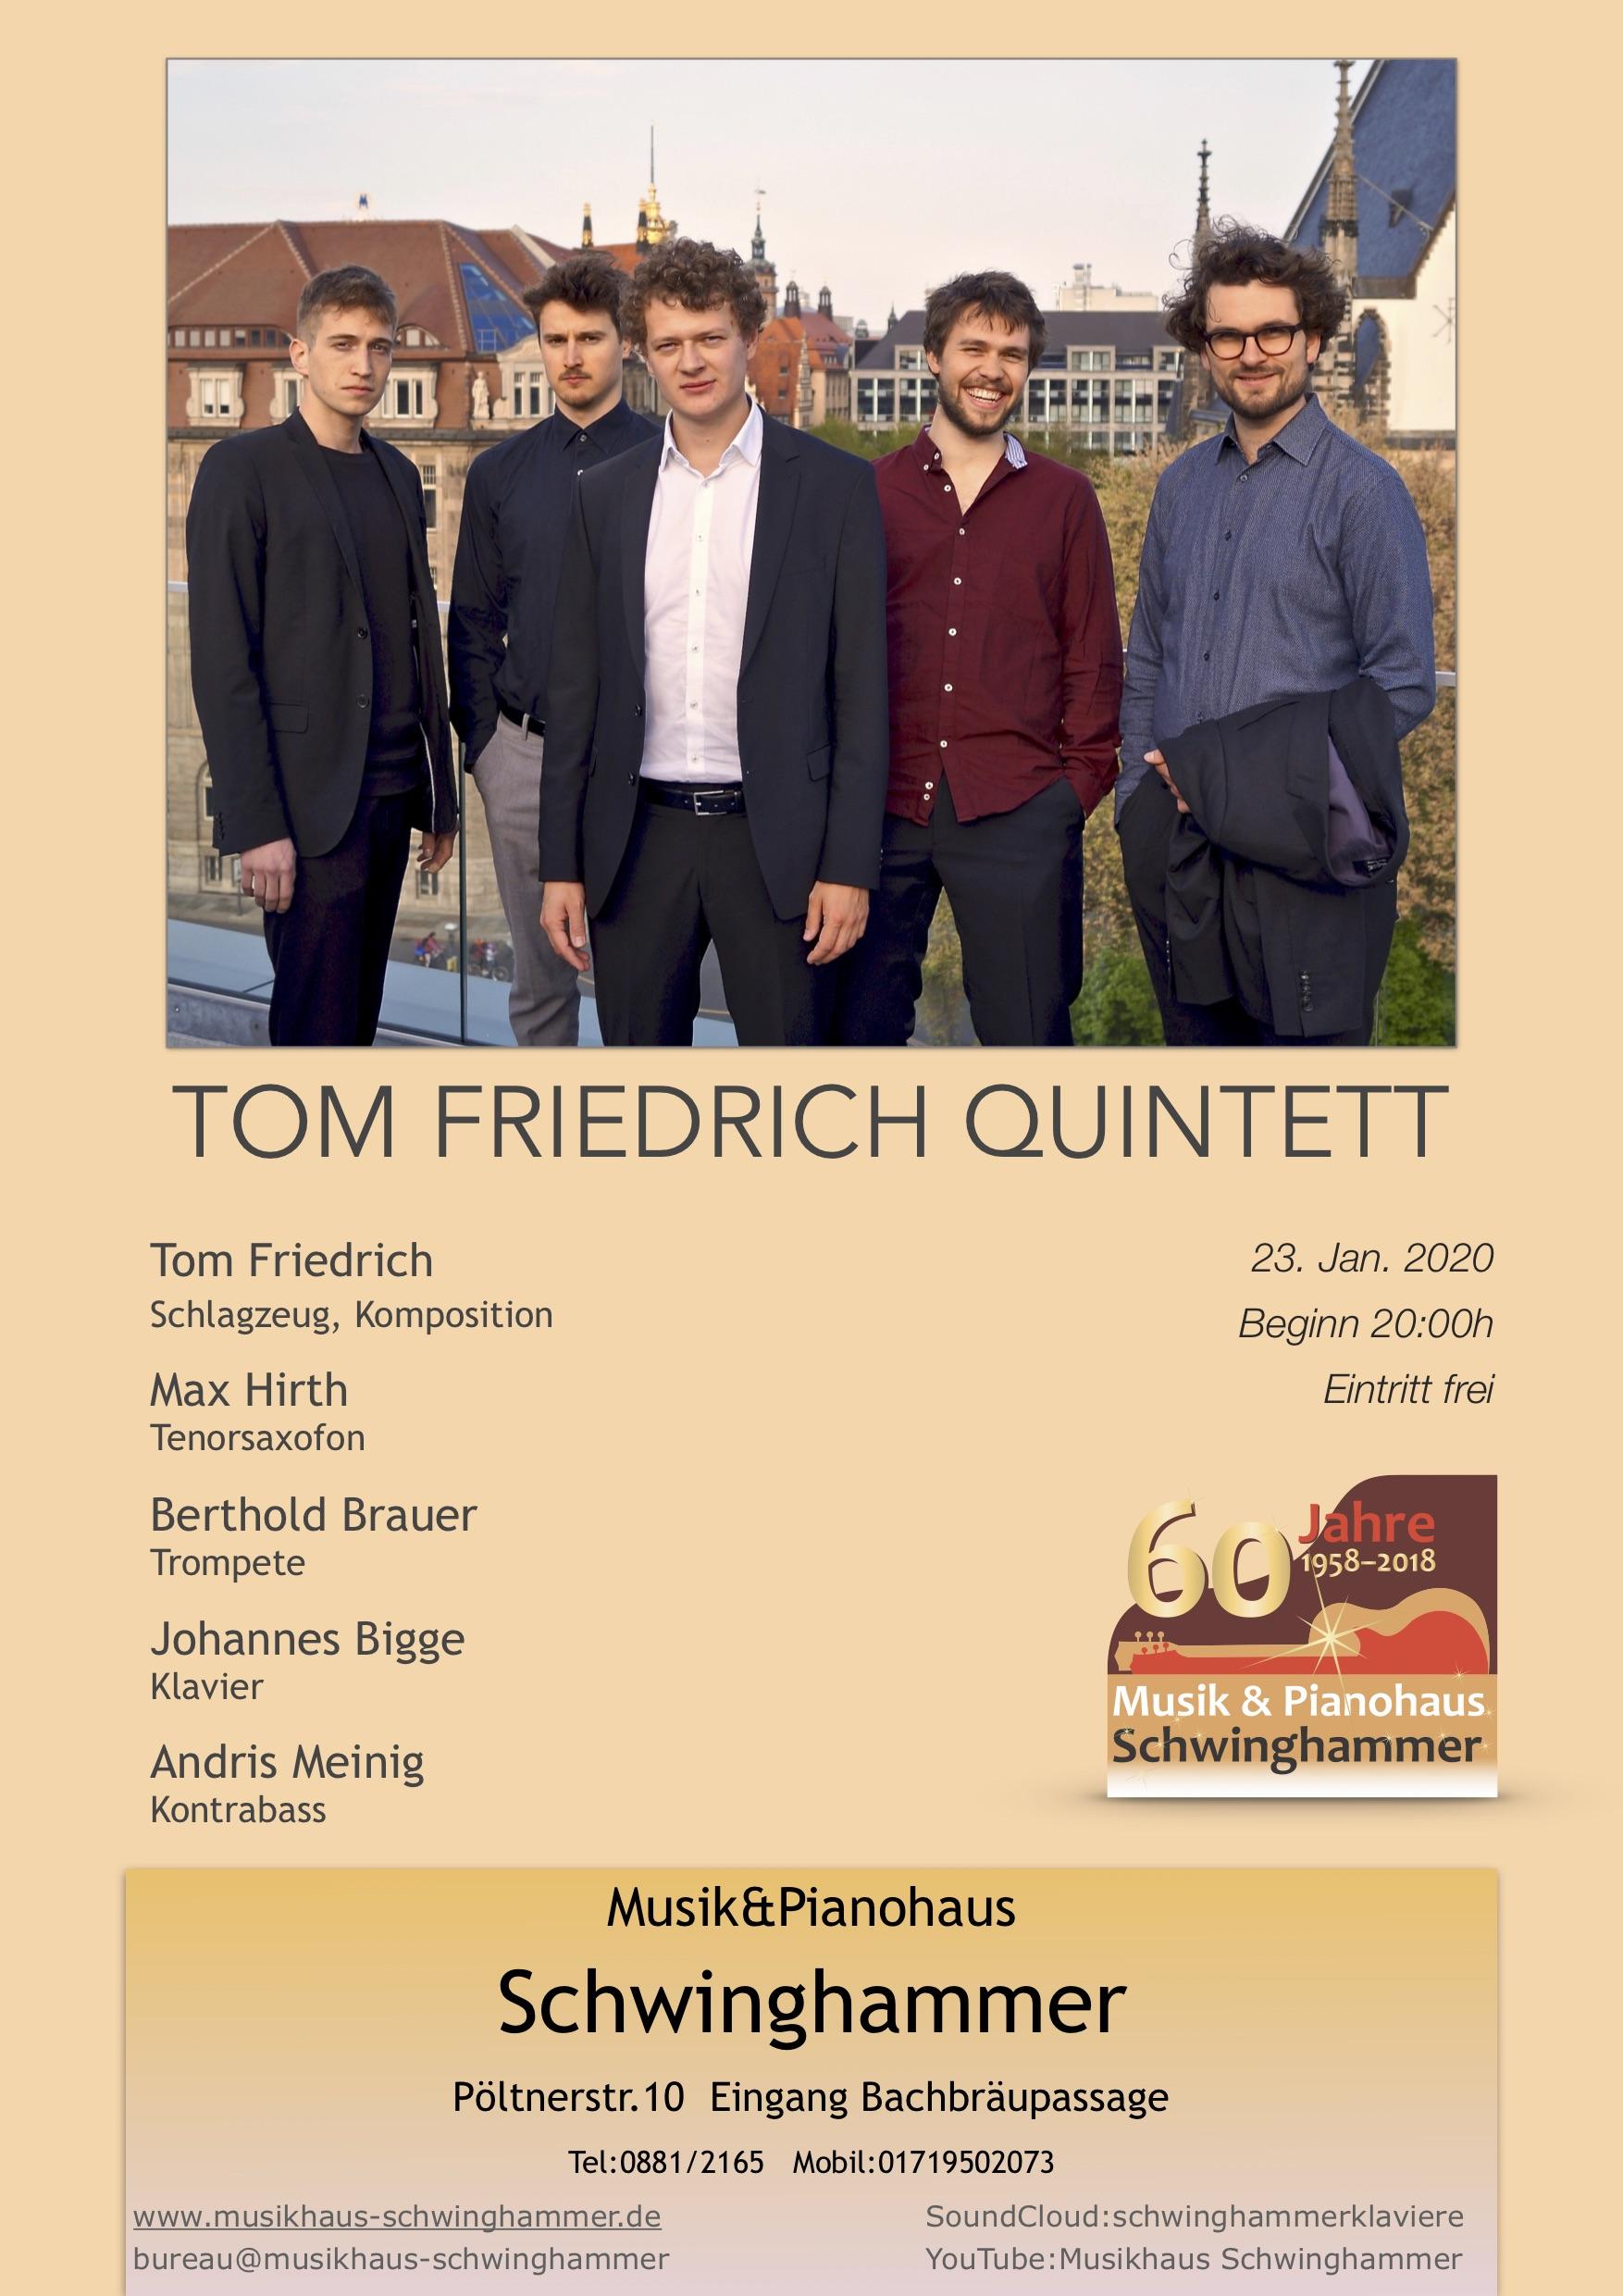 TomFriedrich5_Plakat_Final Kopie